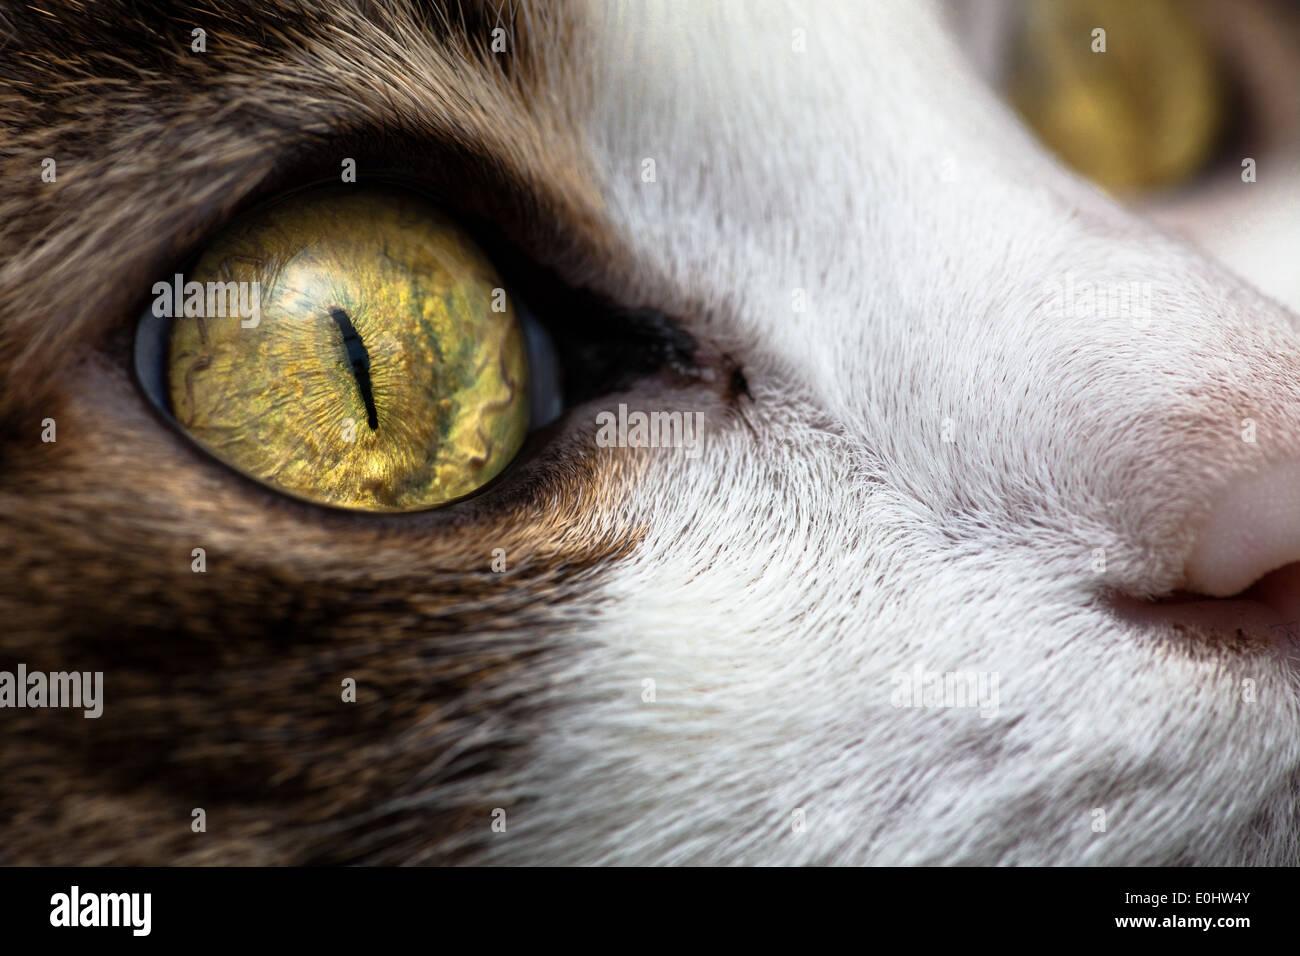 Katzenblick - Cat lo sguardo Immagini Stock